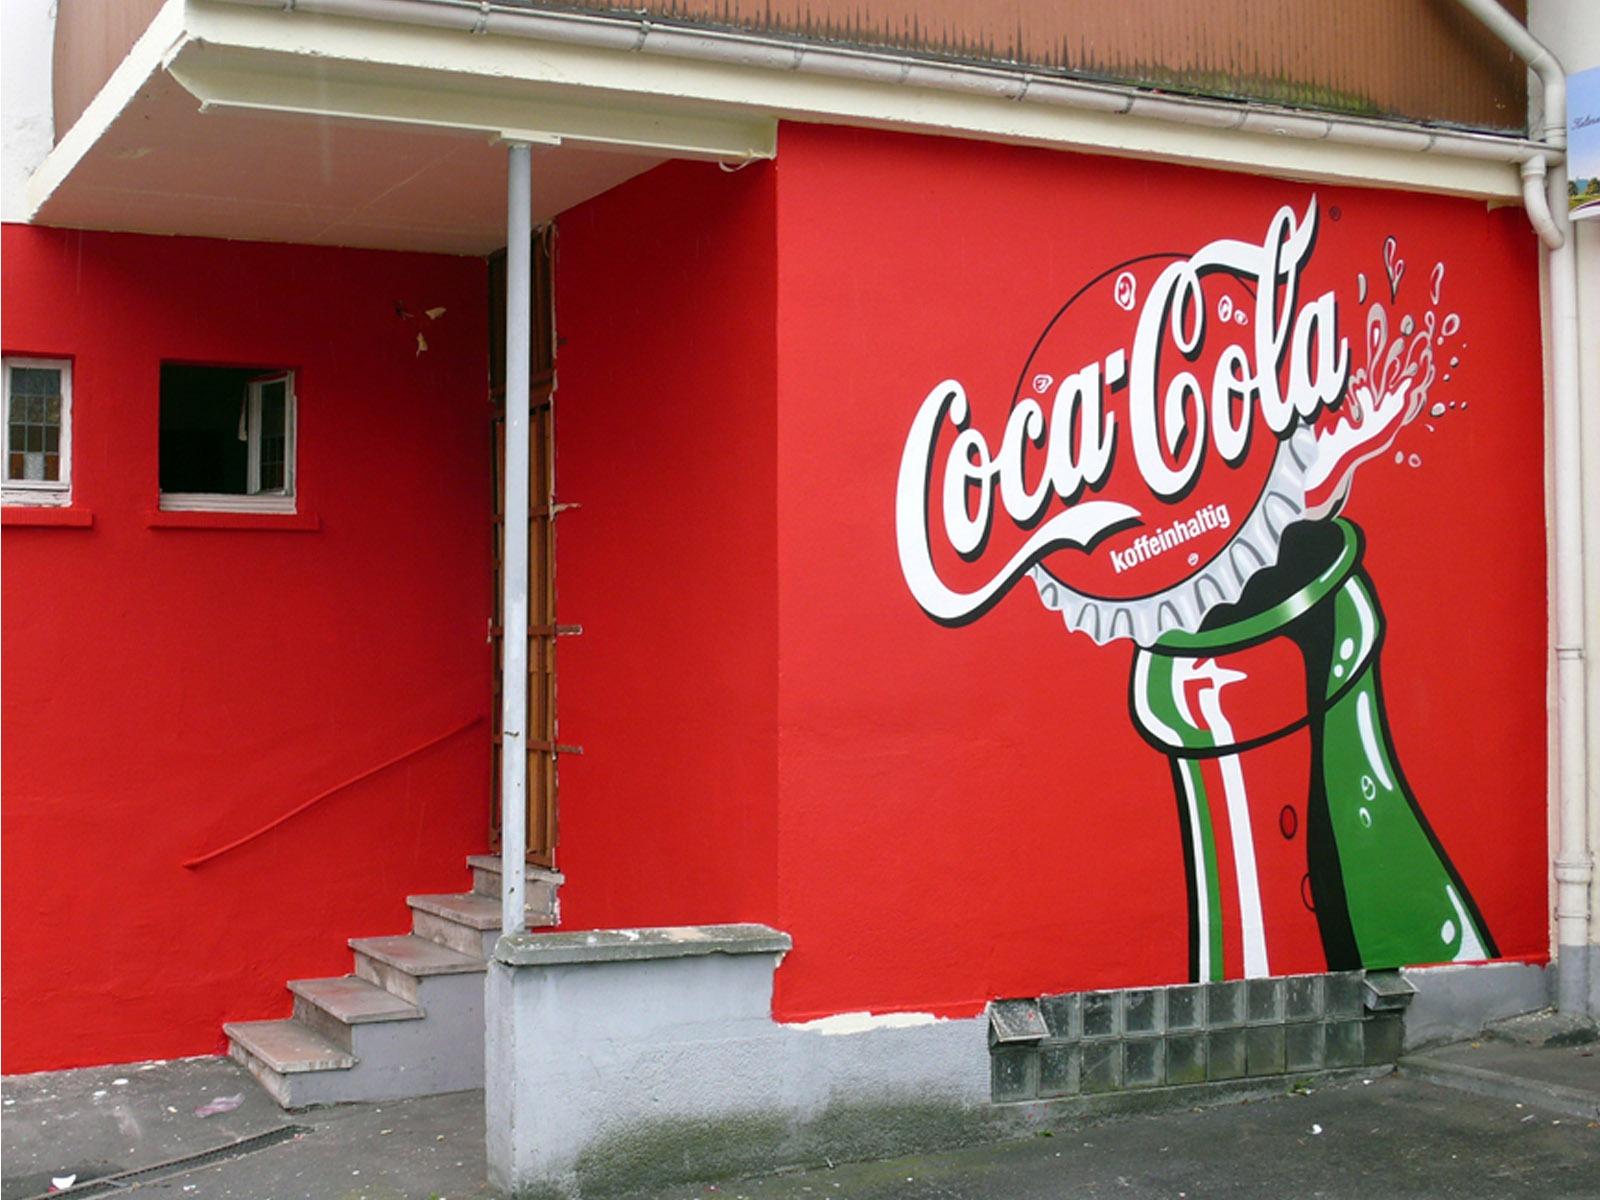 graffitiauftrag_graffitikuenstler_artmos4_cocacola_logo_illustrativ